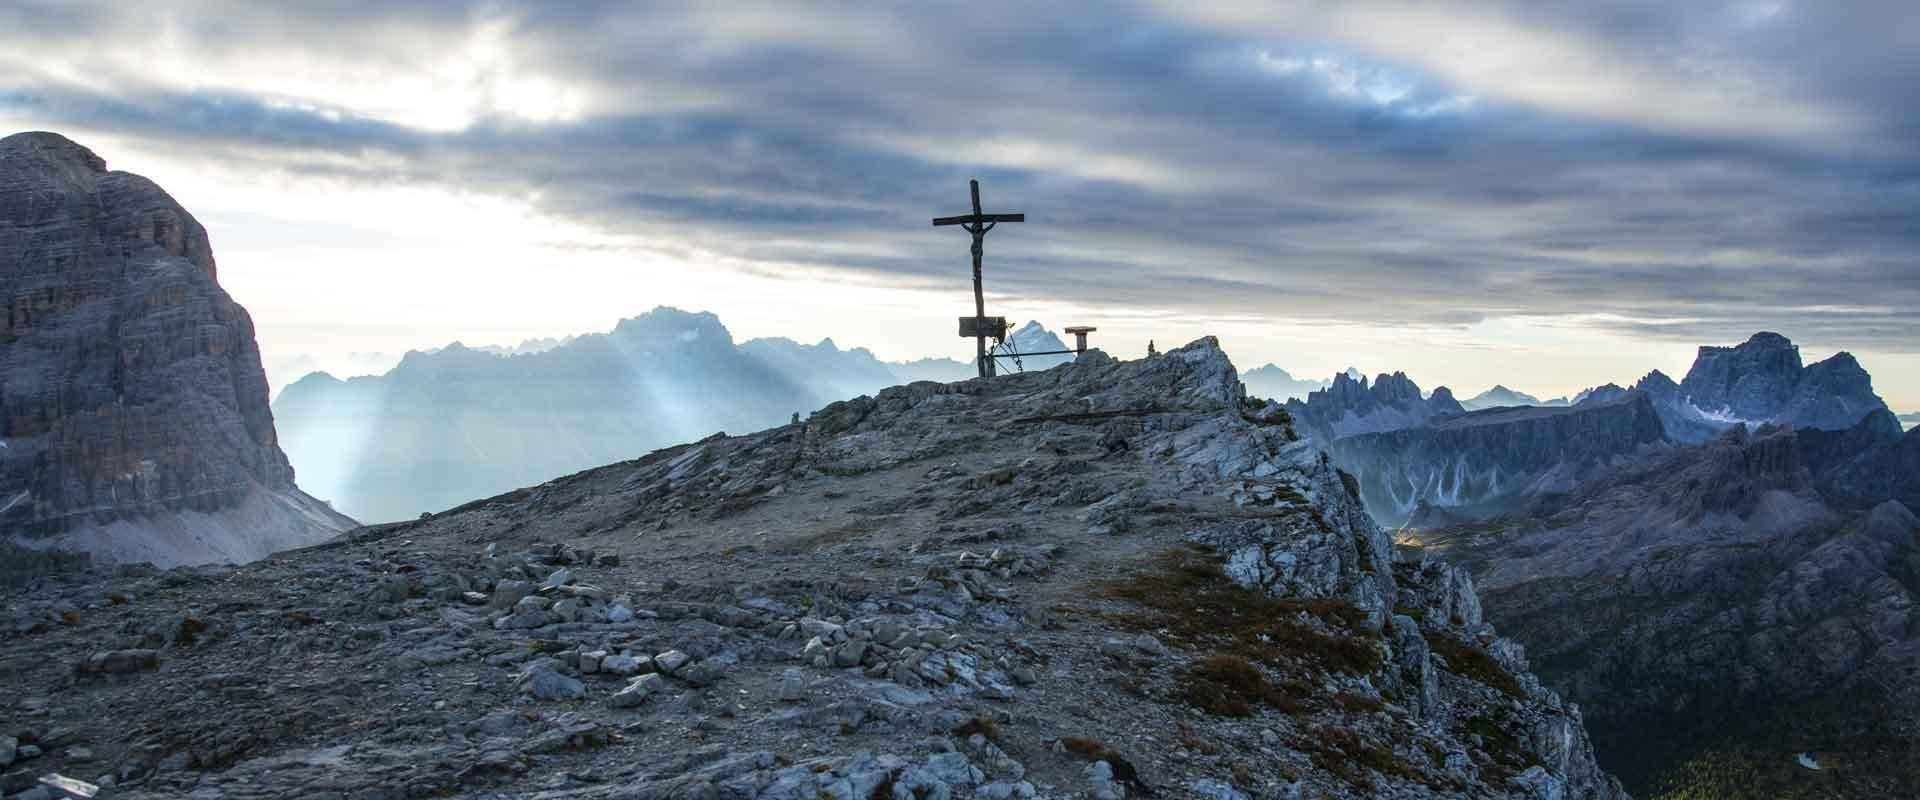 Gipfelkreuz des Lagazuoi - Foto: Stefano Zardini